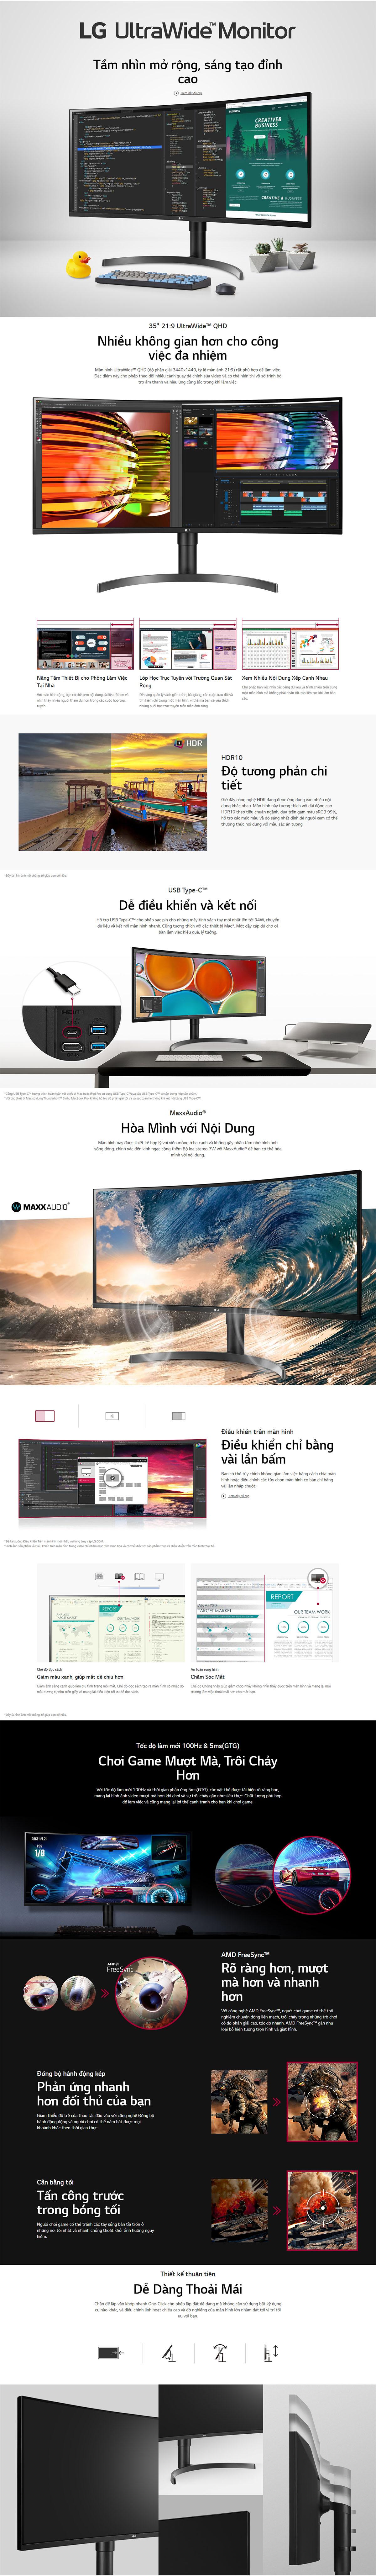 LG Ultrawide 35WN75C B Monitor Details 1200p